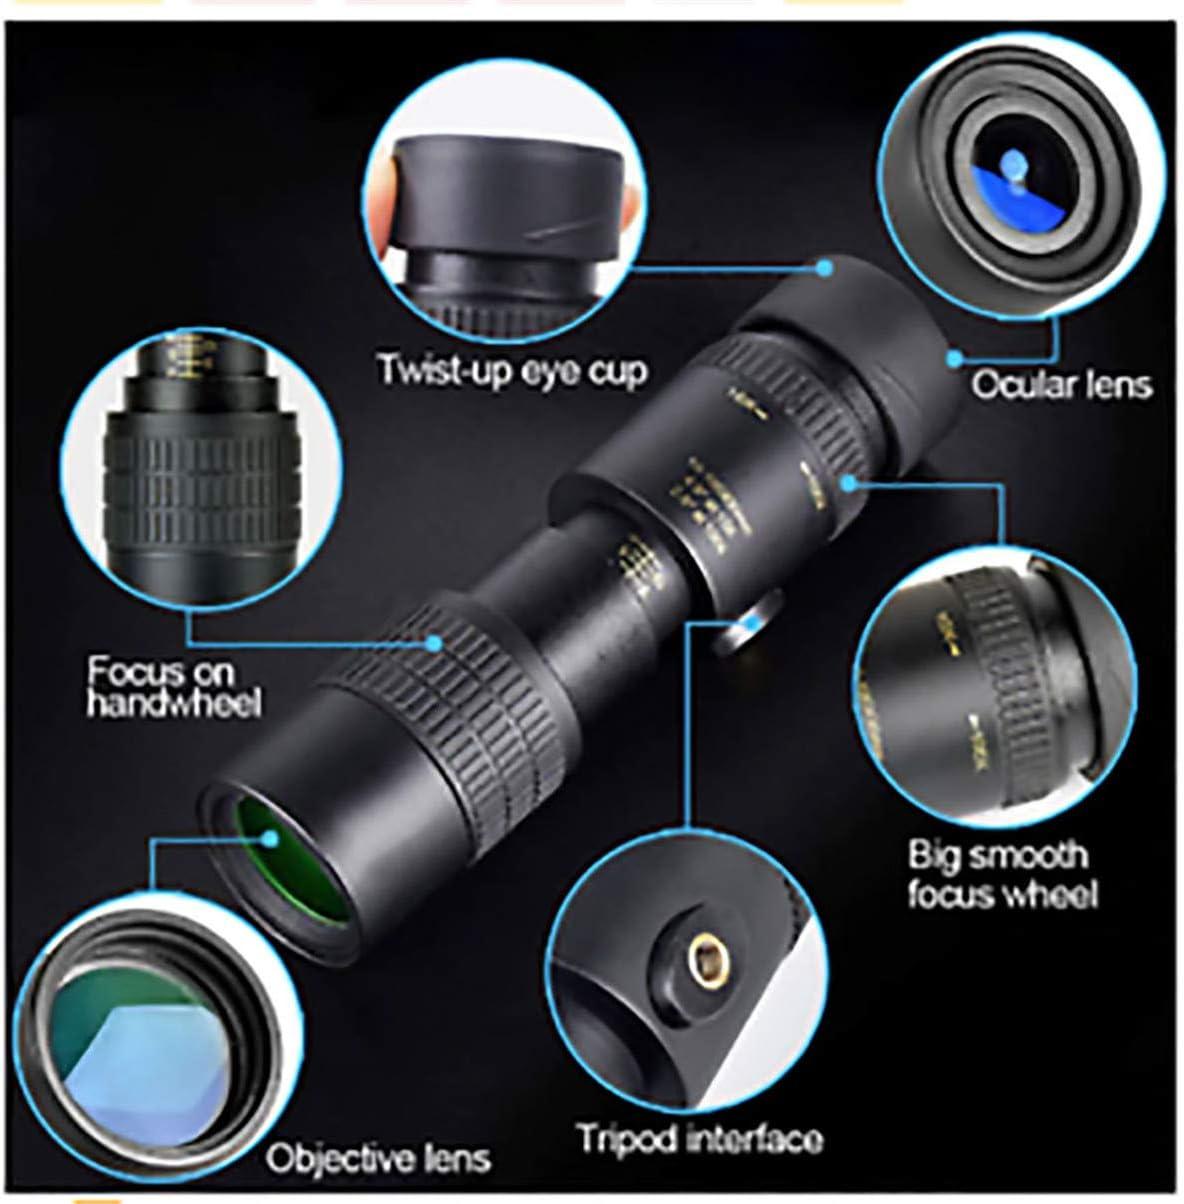 Monocular Telescope for Smartphone 4K Super Telephoto Zoom Monocular Telescope with BAK4 Prism Lens for Beach Travel Outdoor Activities Sports 4K 10-100X30mm